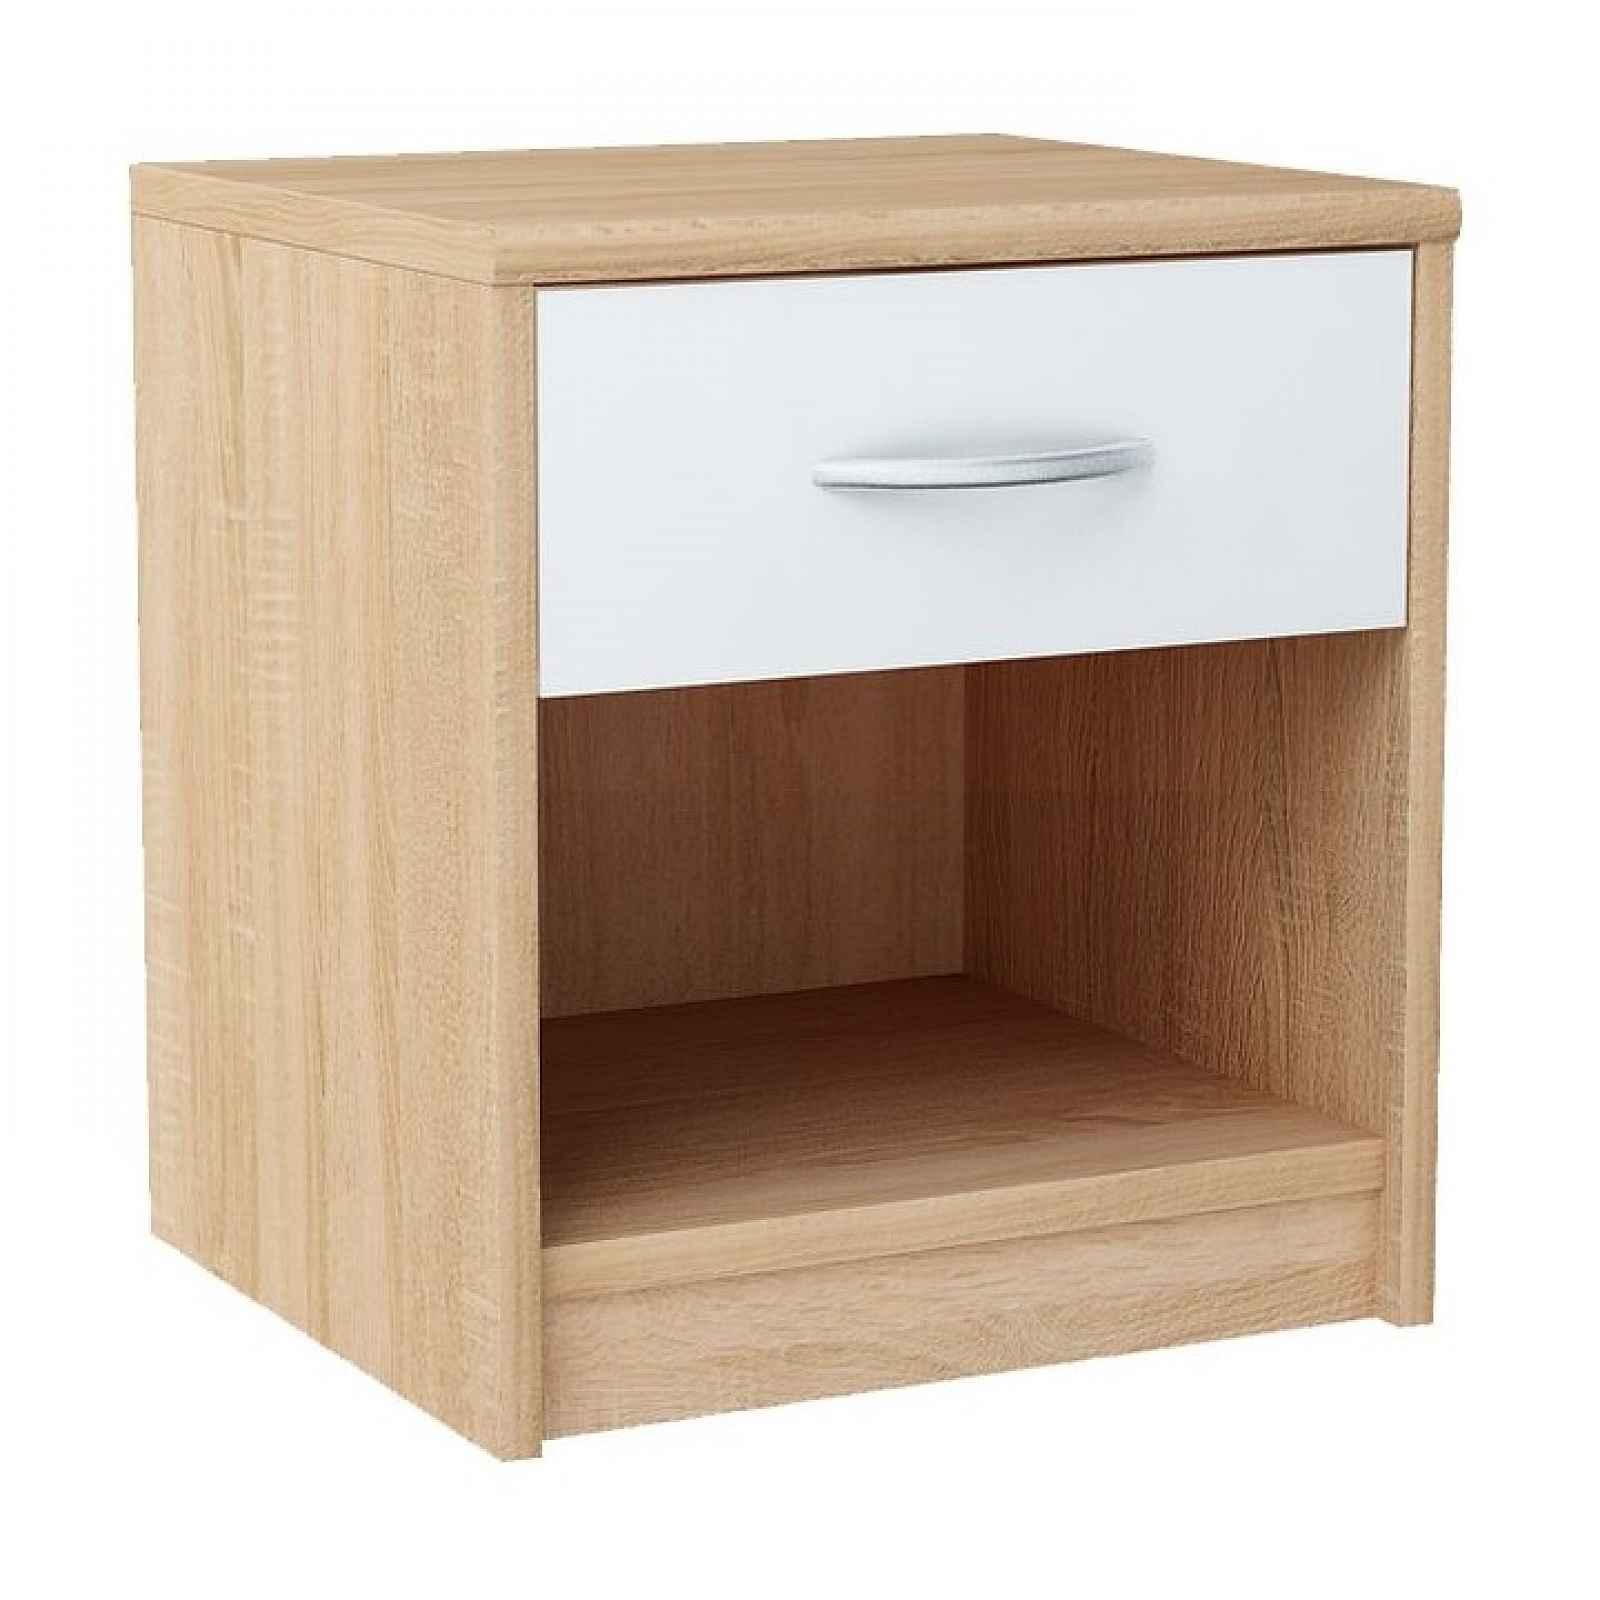 Noční stolek, dub sonoma / bílá, MARKER 0000193977 Tempo Kondela